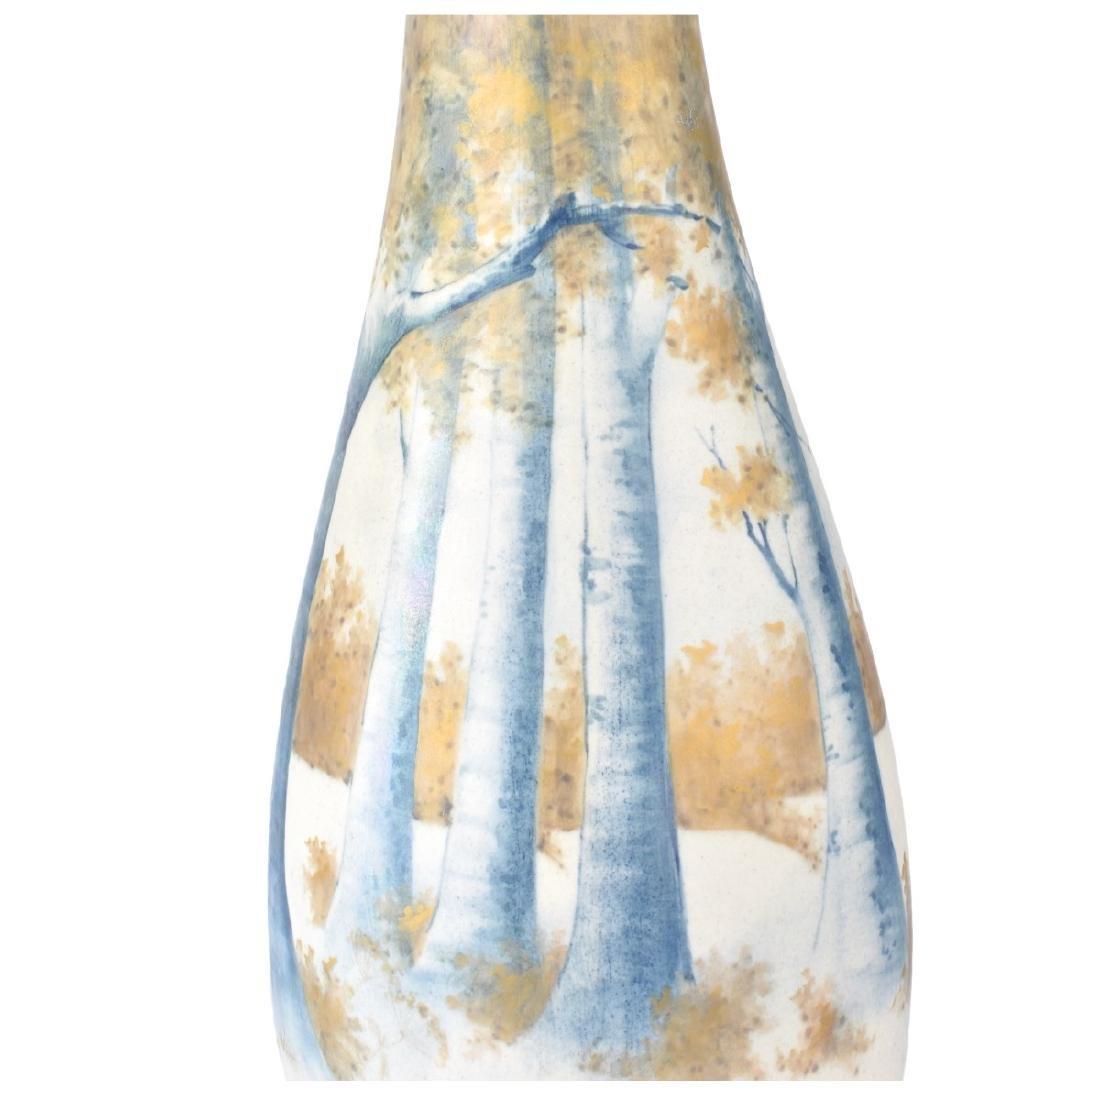 Paul Daschel Turn Teplitz Porcelain Vase - 3